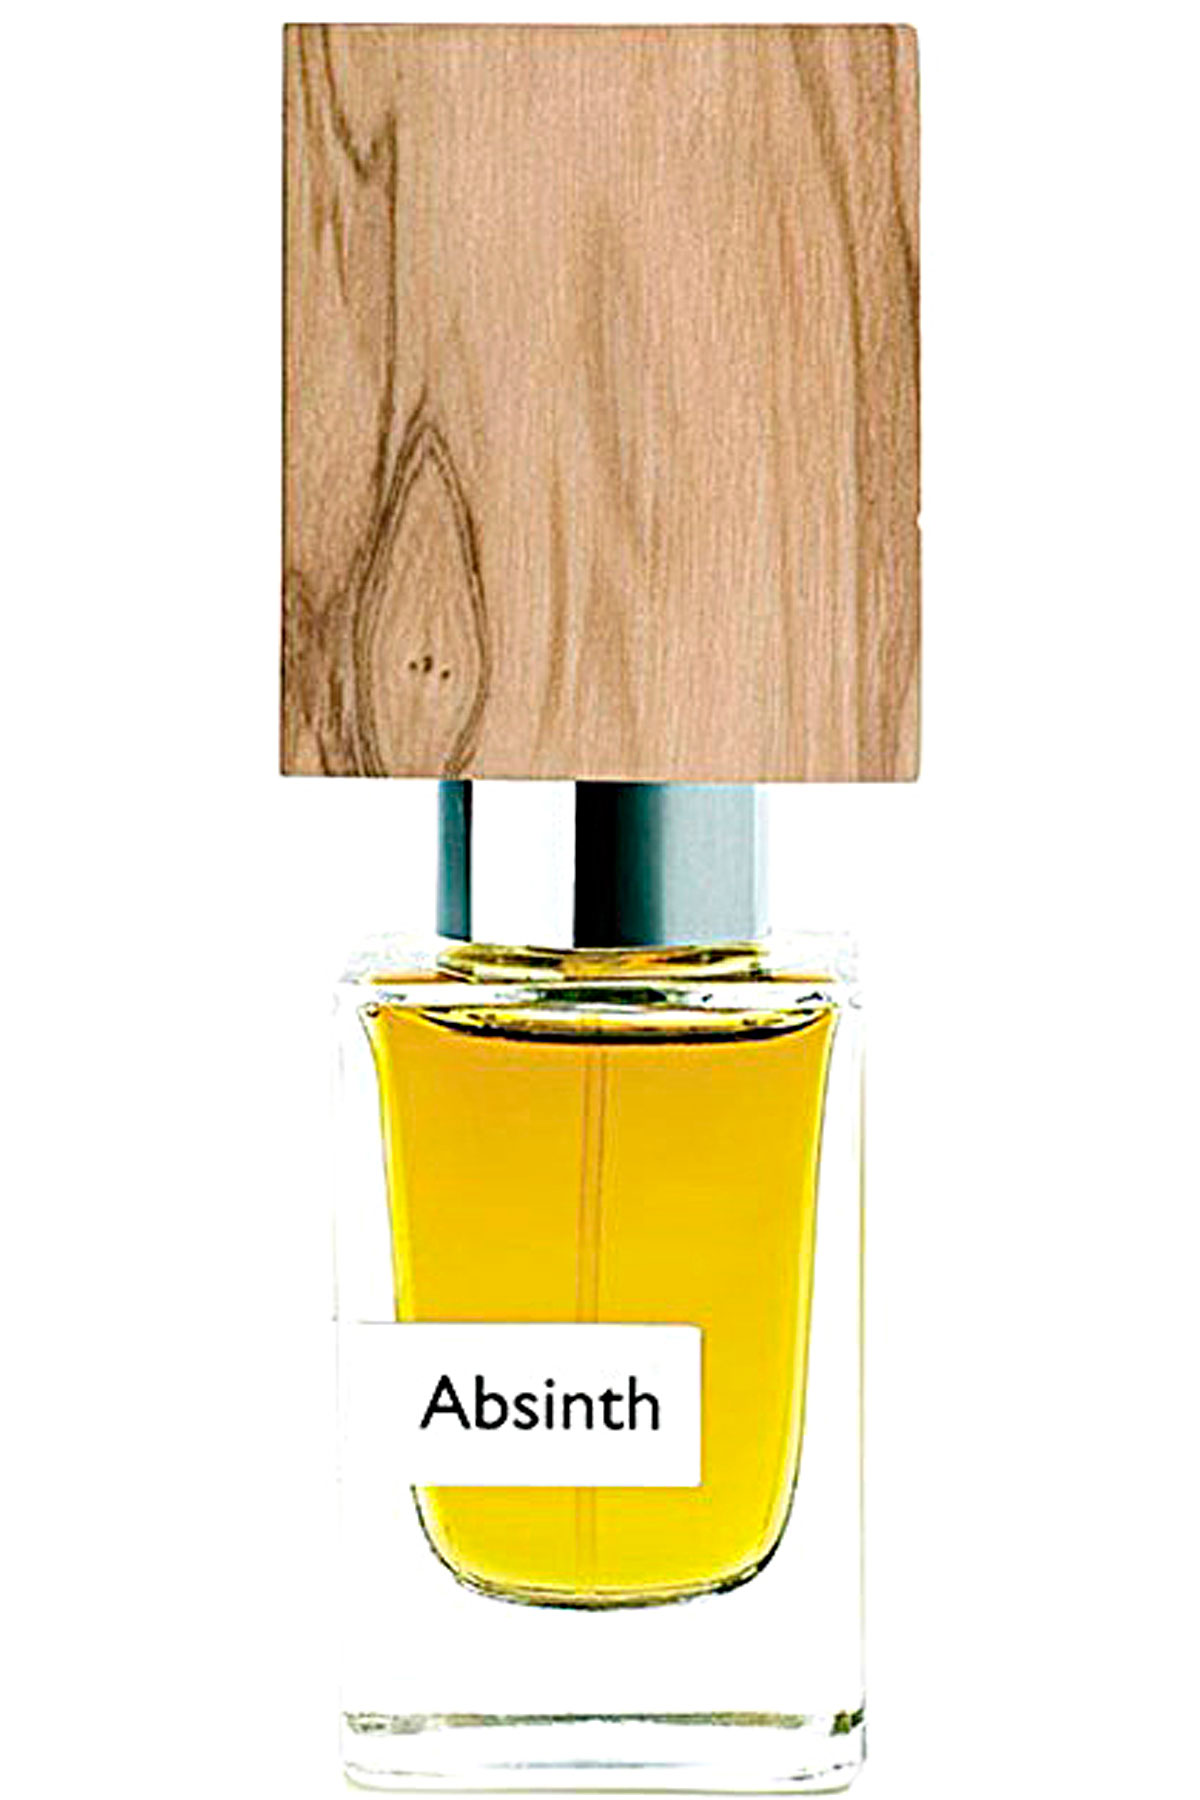 Nasomatto Fragrances for Women, Absinth - Extrait De Parfum - 30 Ml, 2019, 30 ml